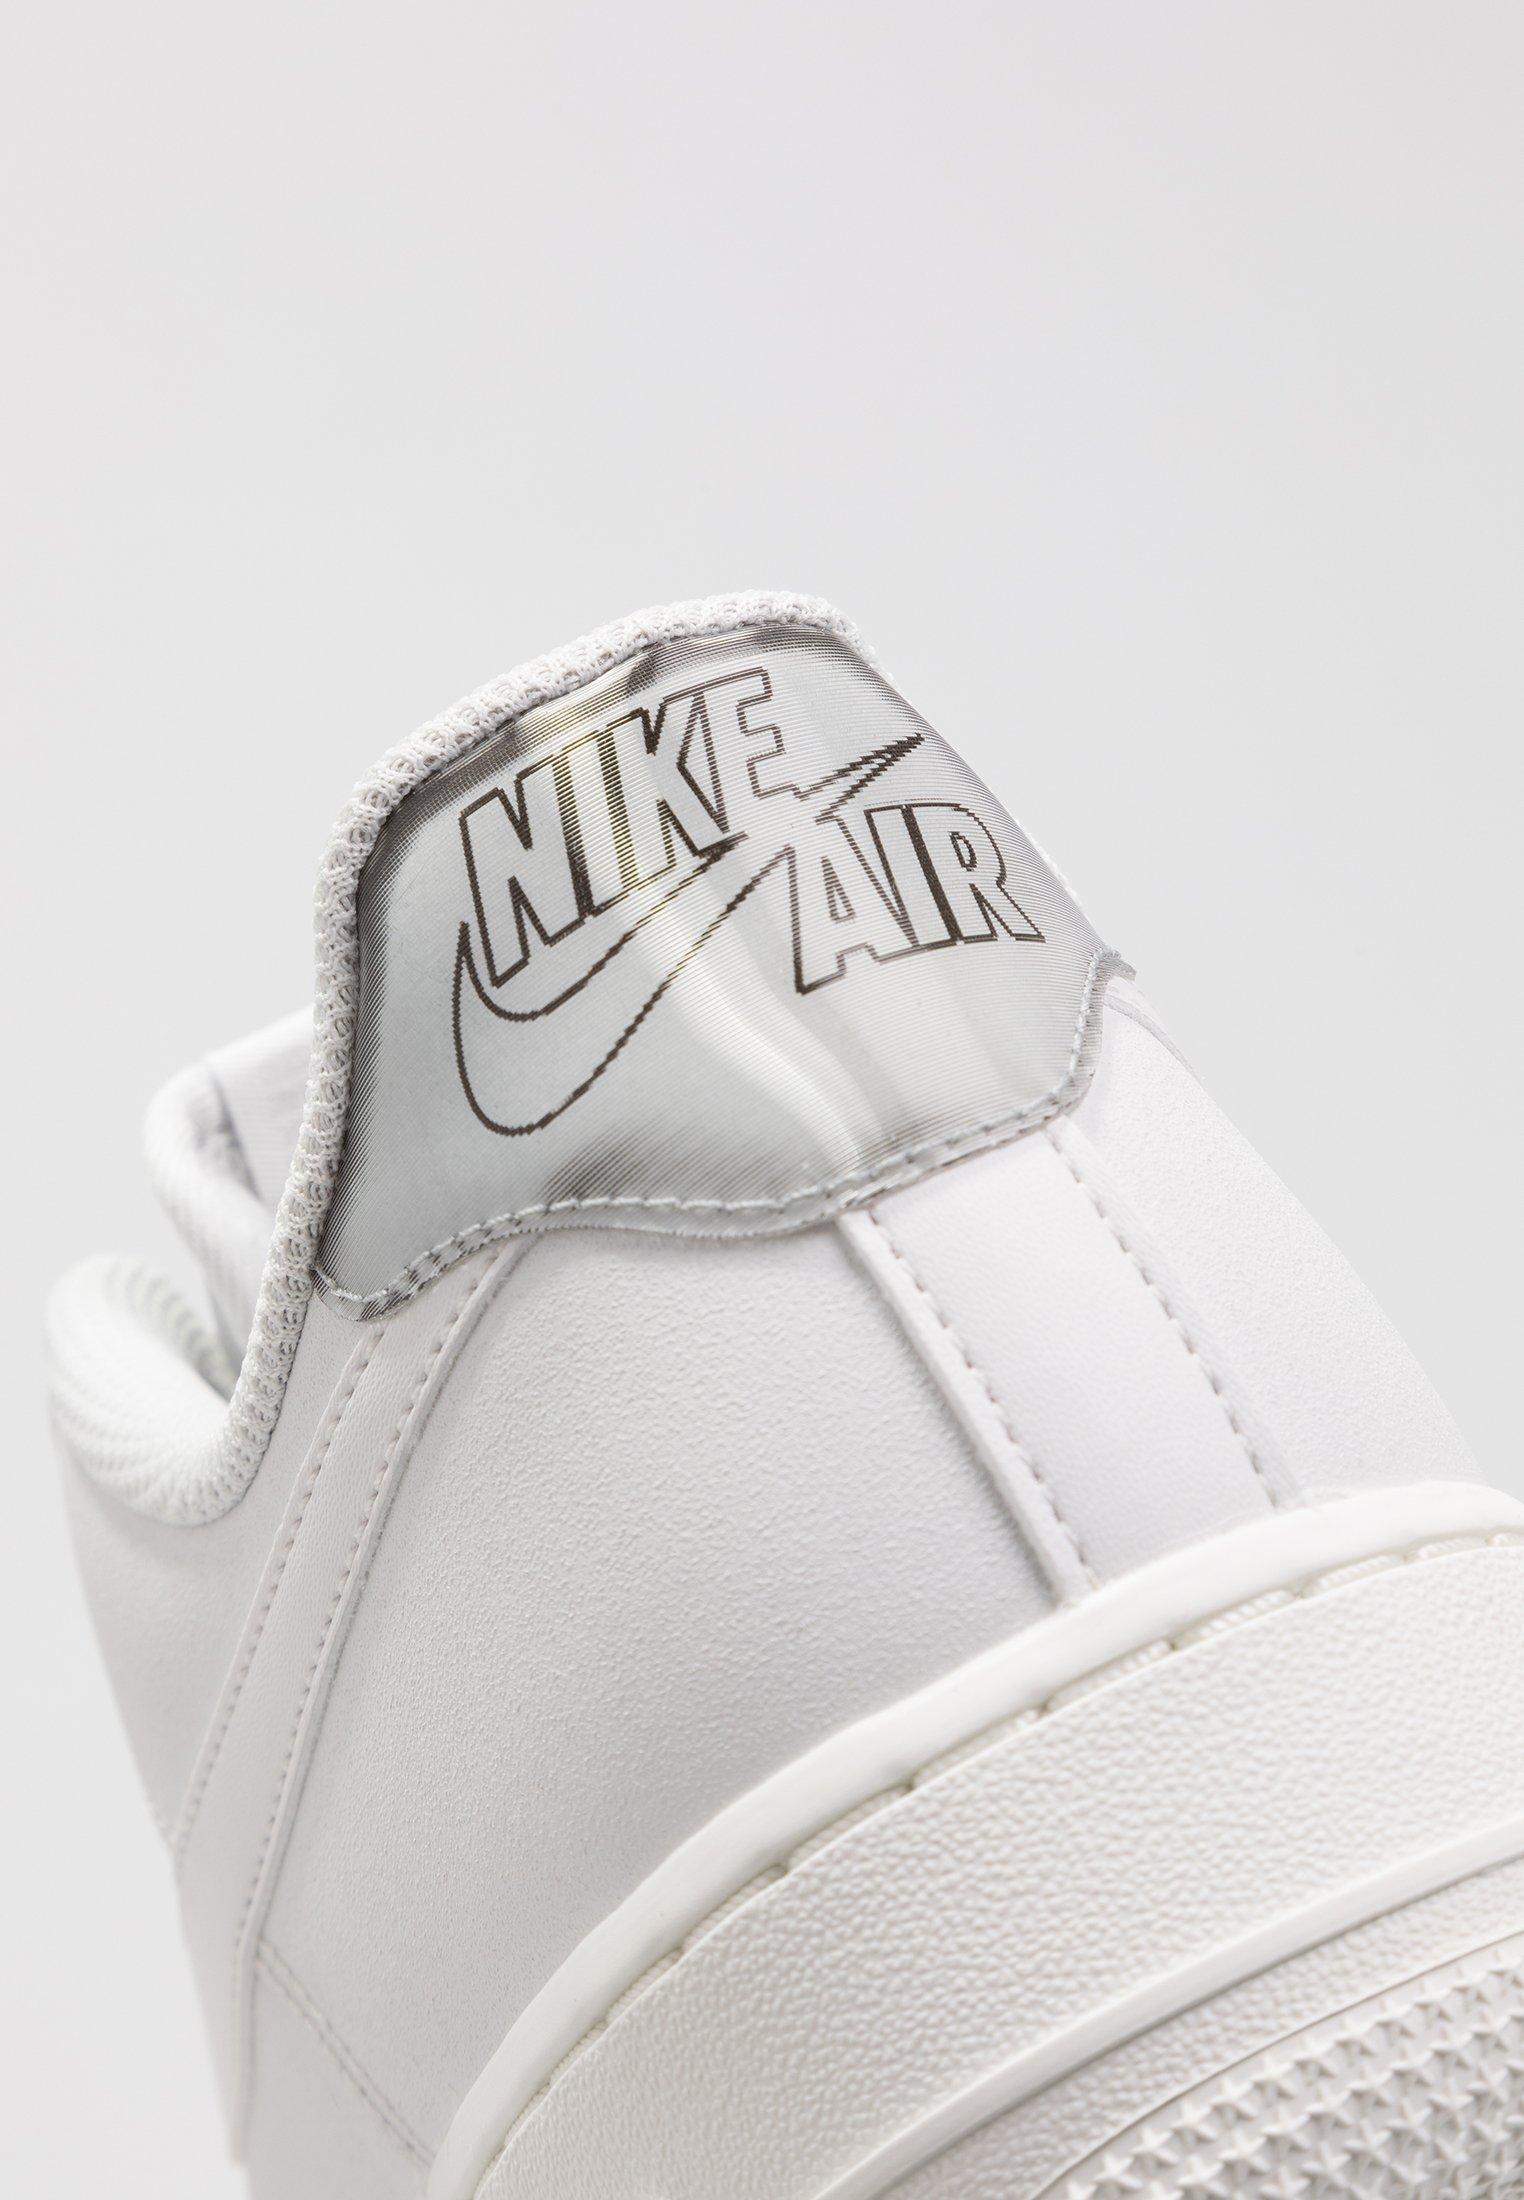 Force 1 summit Platinum Sportswear EssBaskets Air '07 White Basses Nike Tint dorxBQeECW